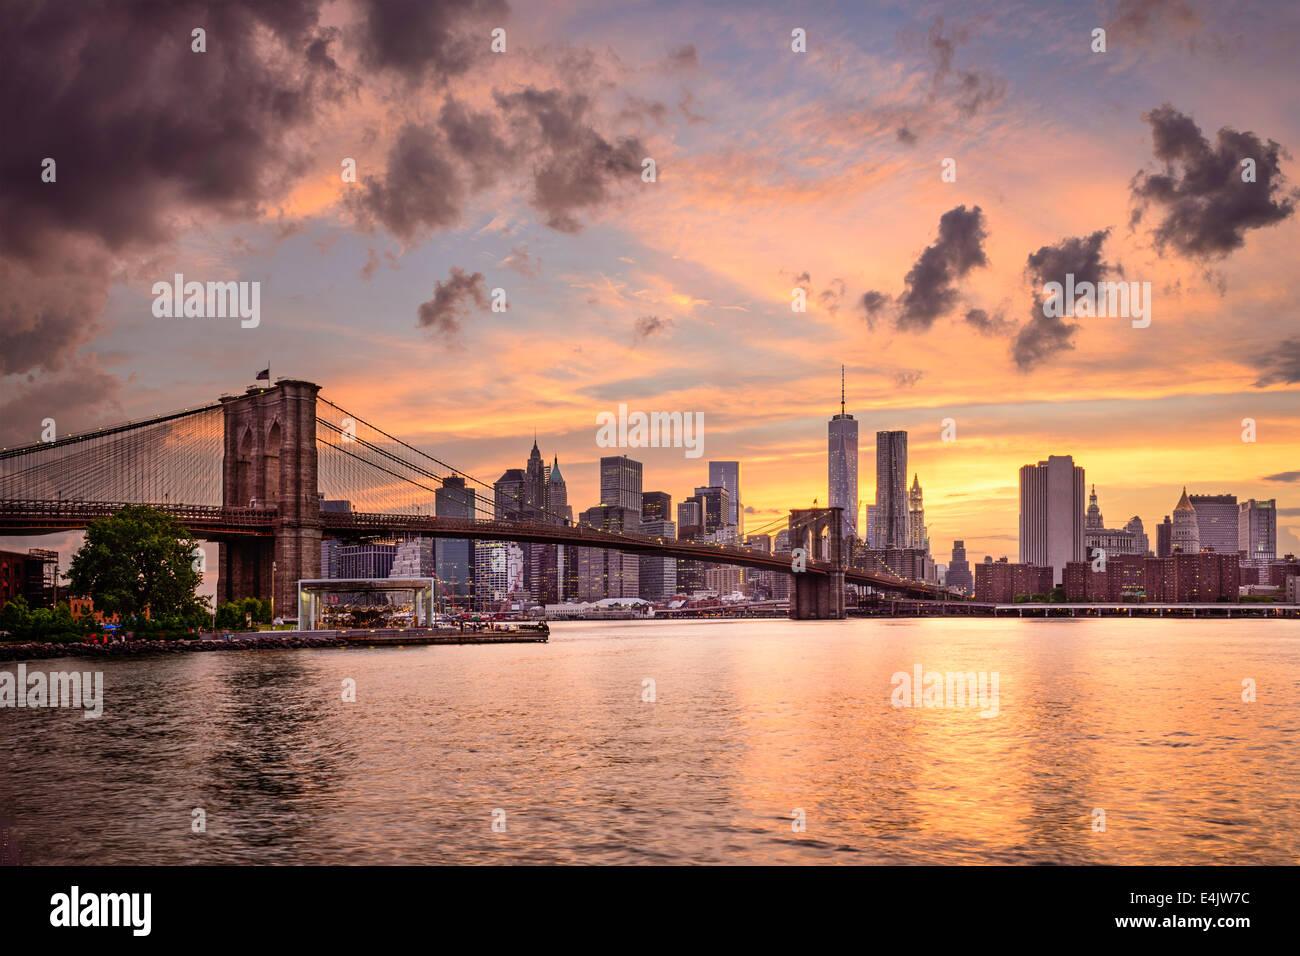 La ville de New York, USA skyline at sunset. Photo Stock